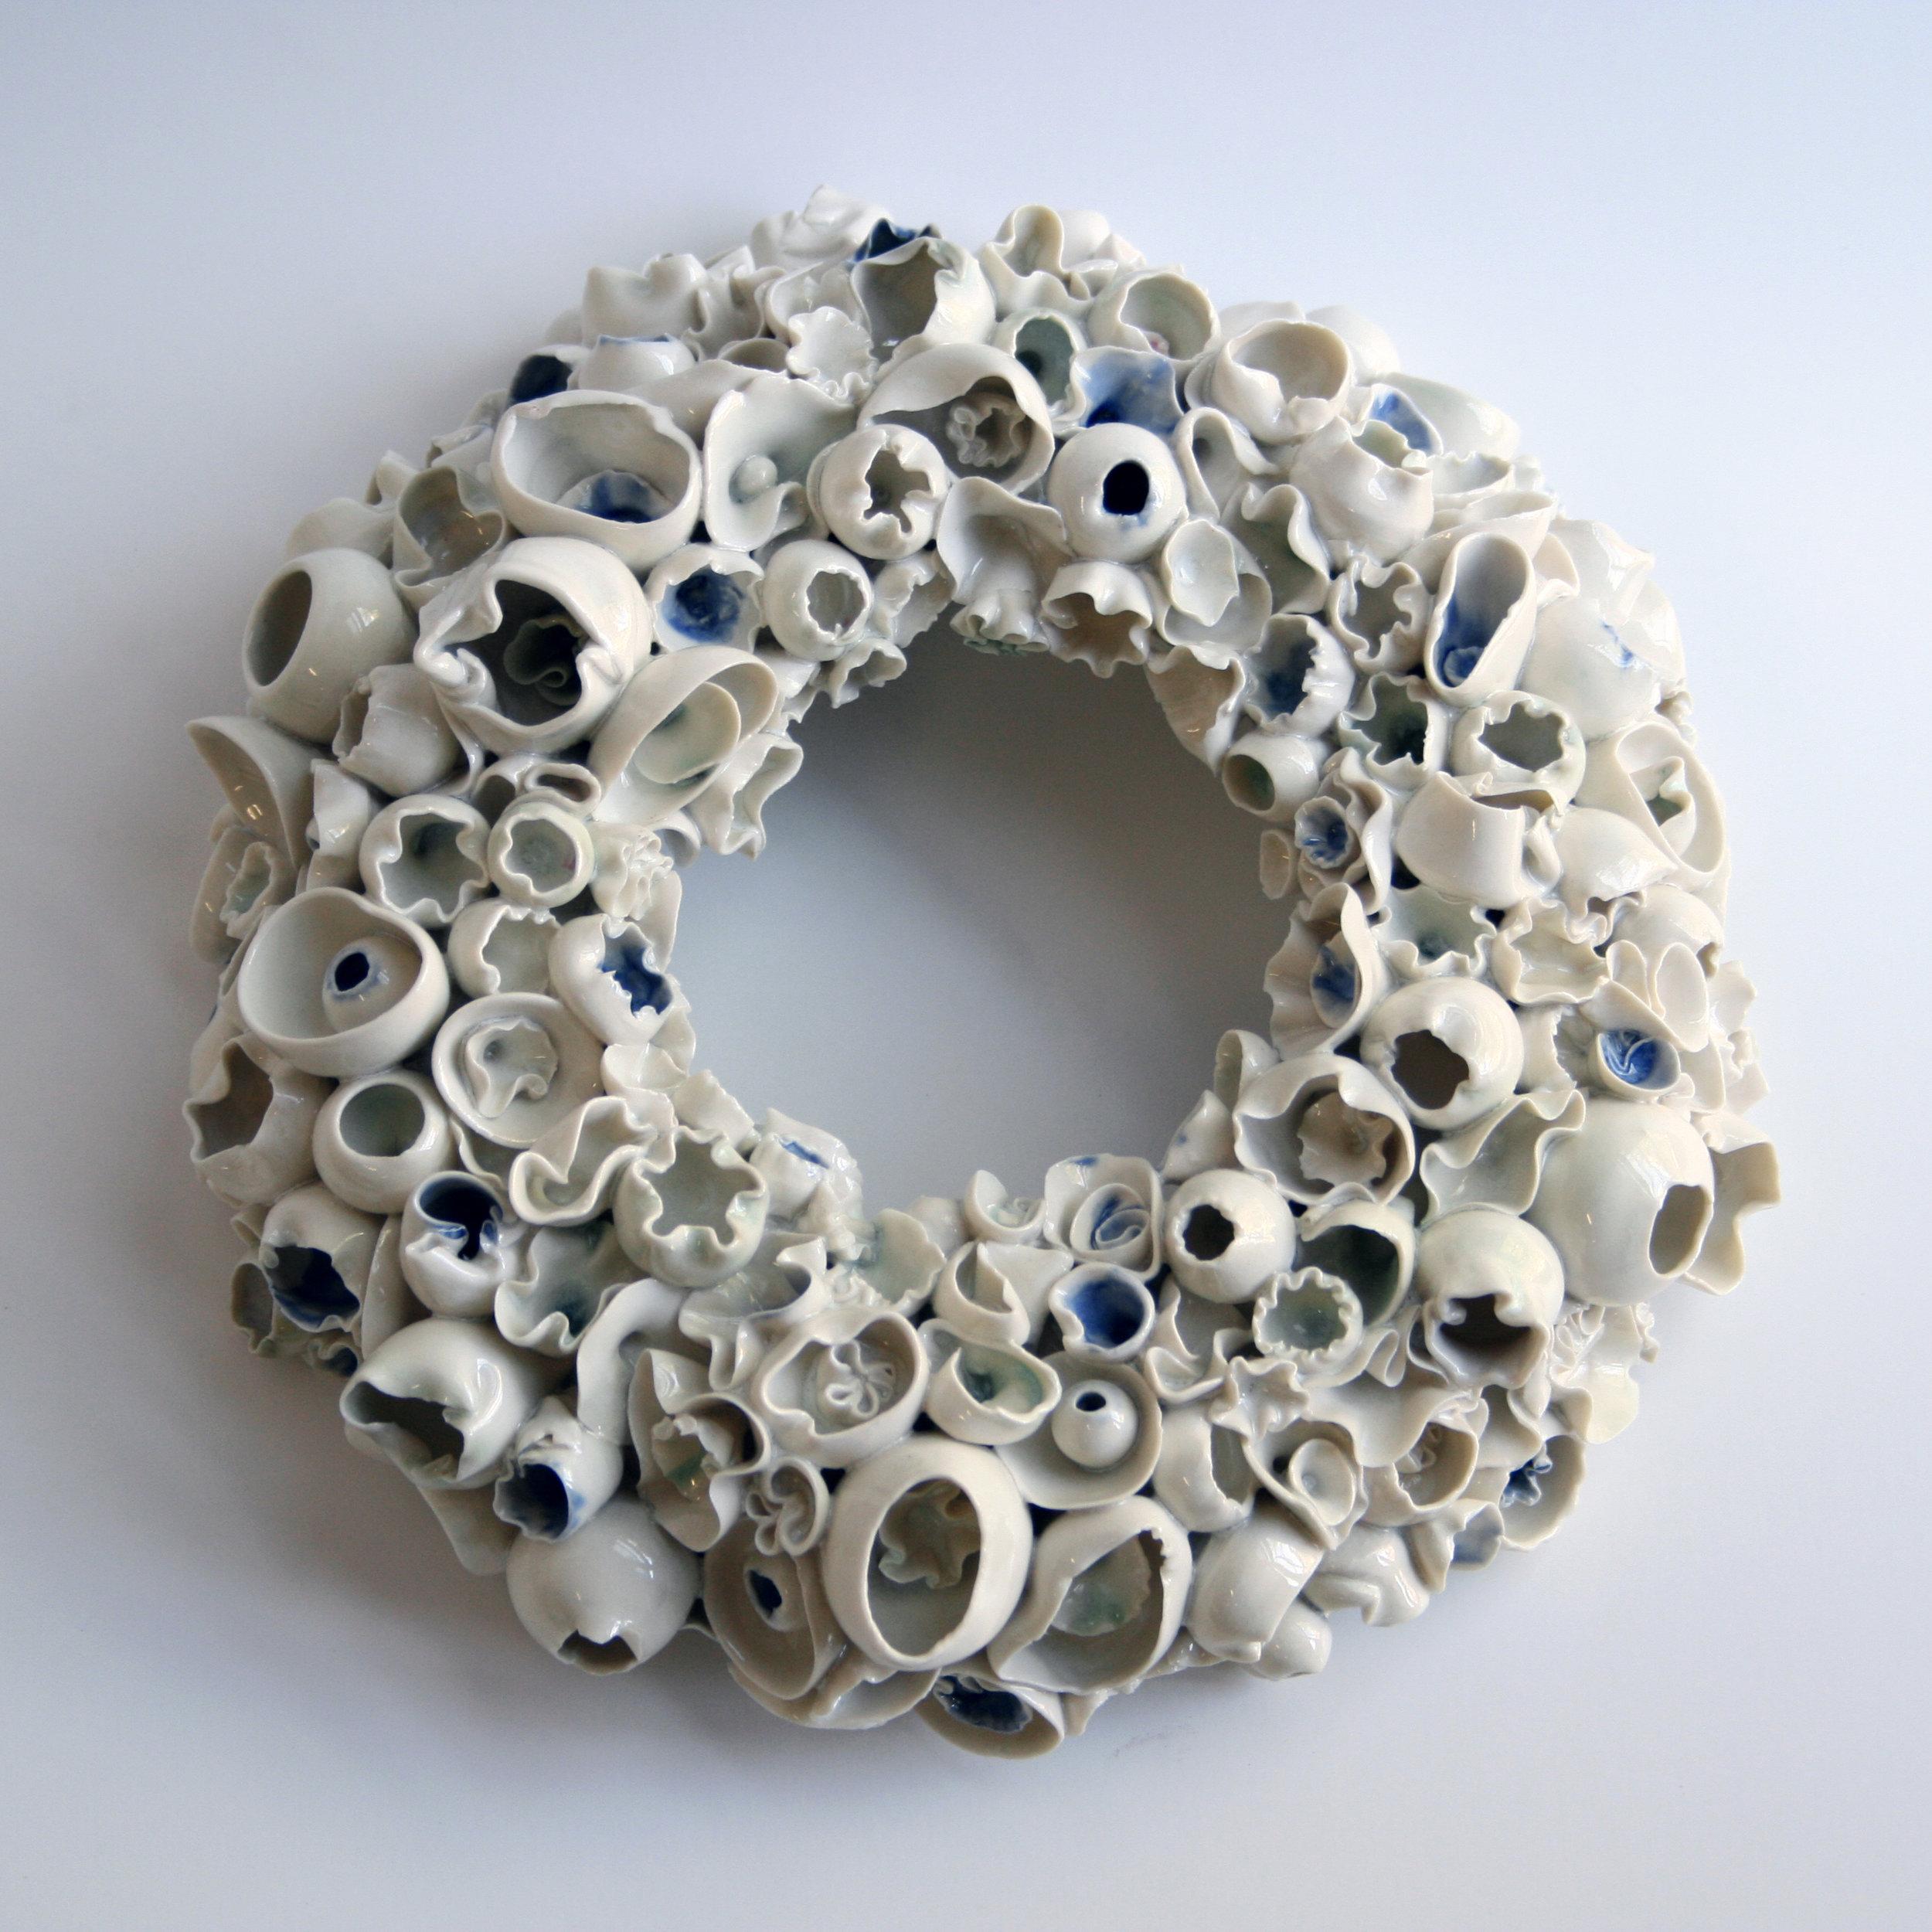 Seashells - Wreath Medium for store.jpg